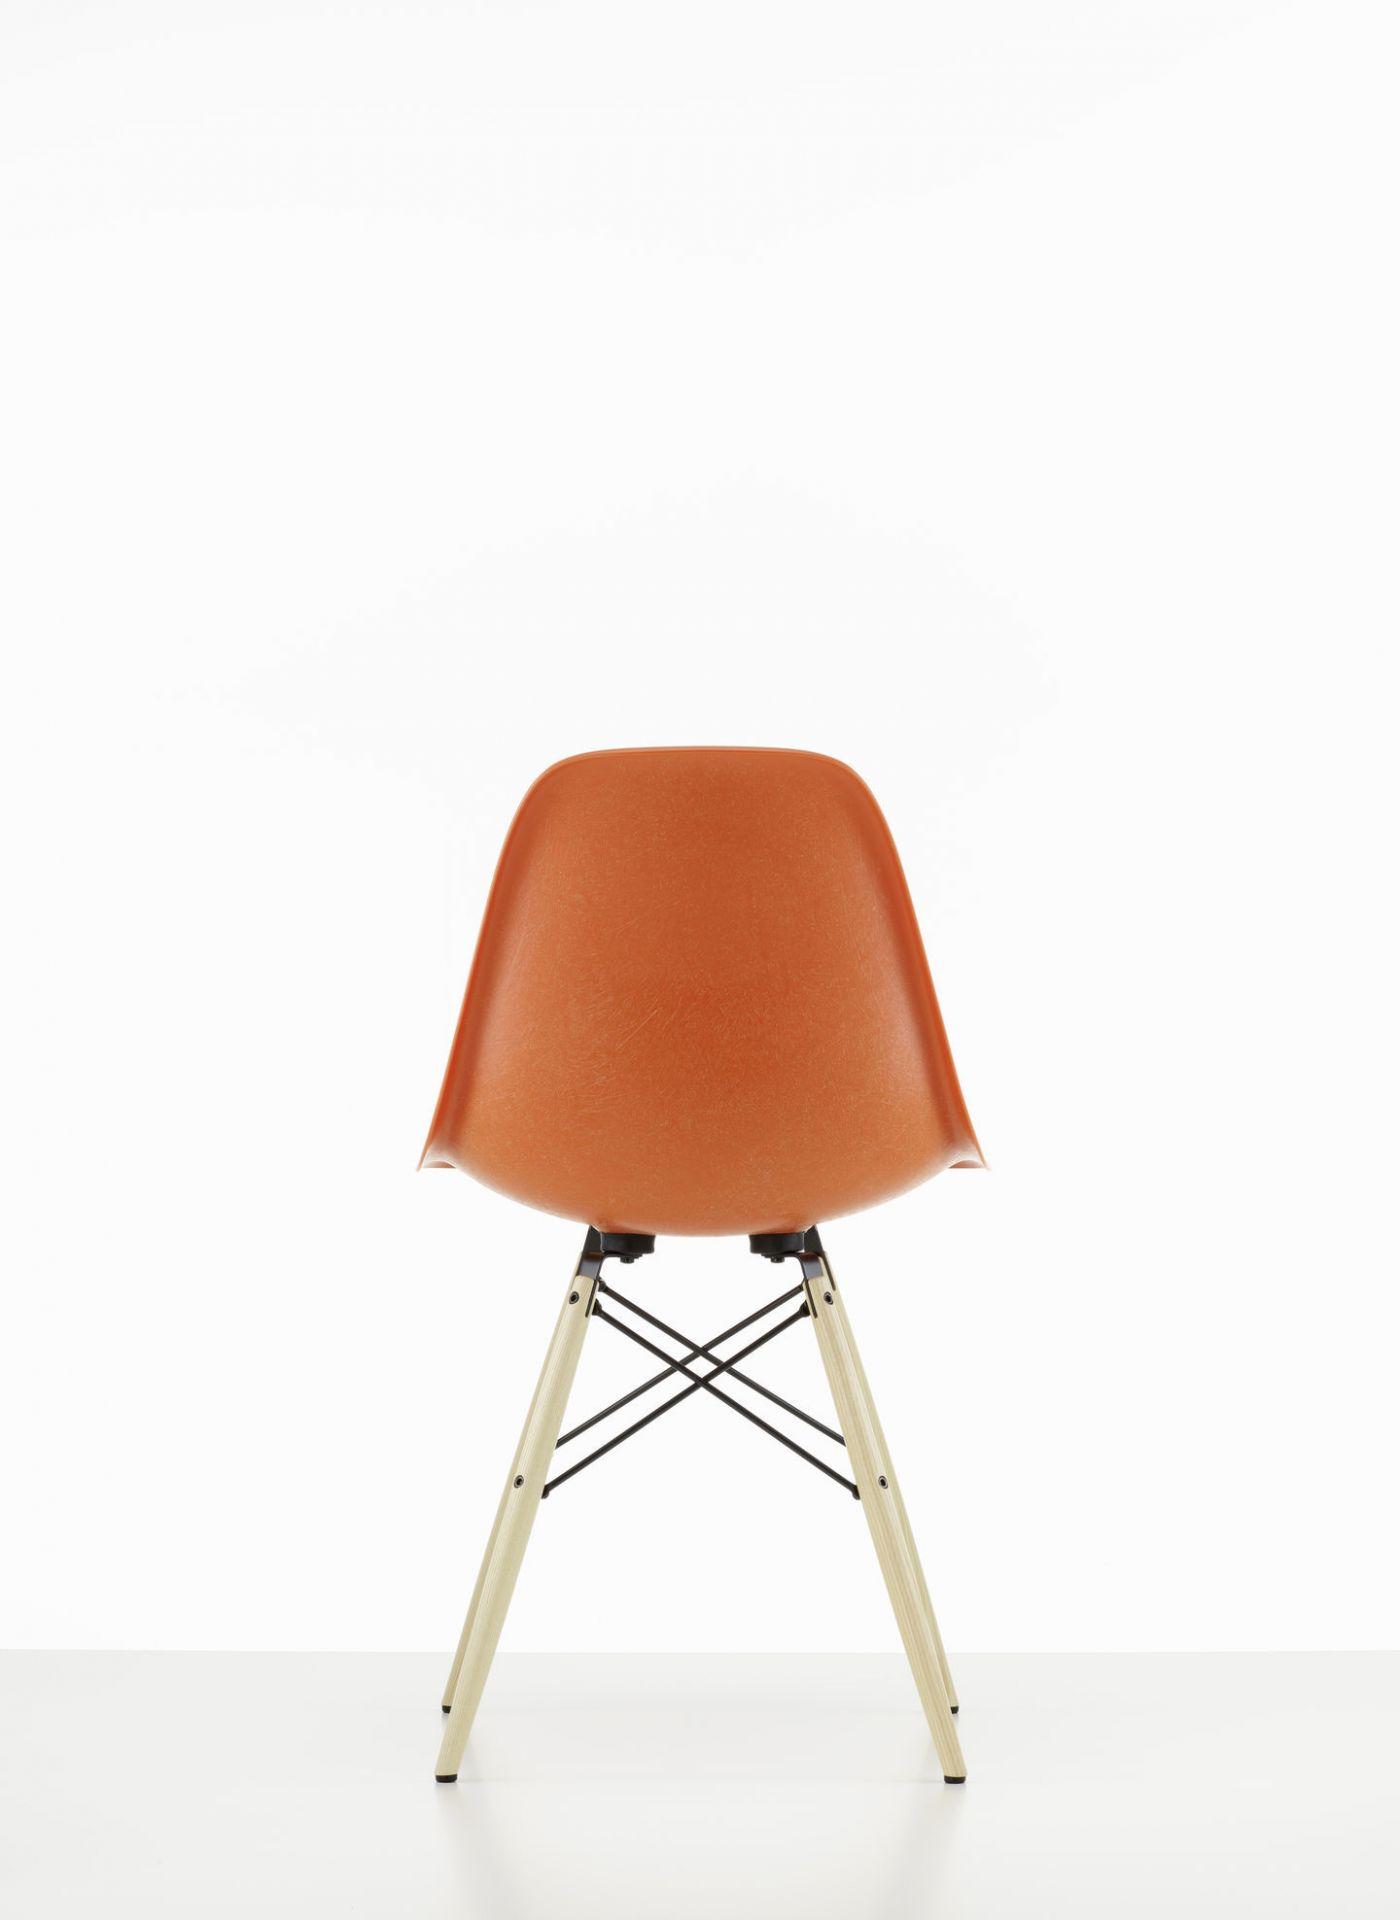 Eames Fiberglass Chair DSW Chair Vitra